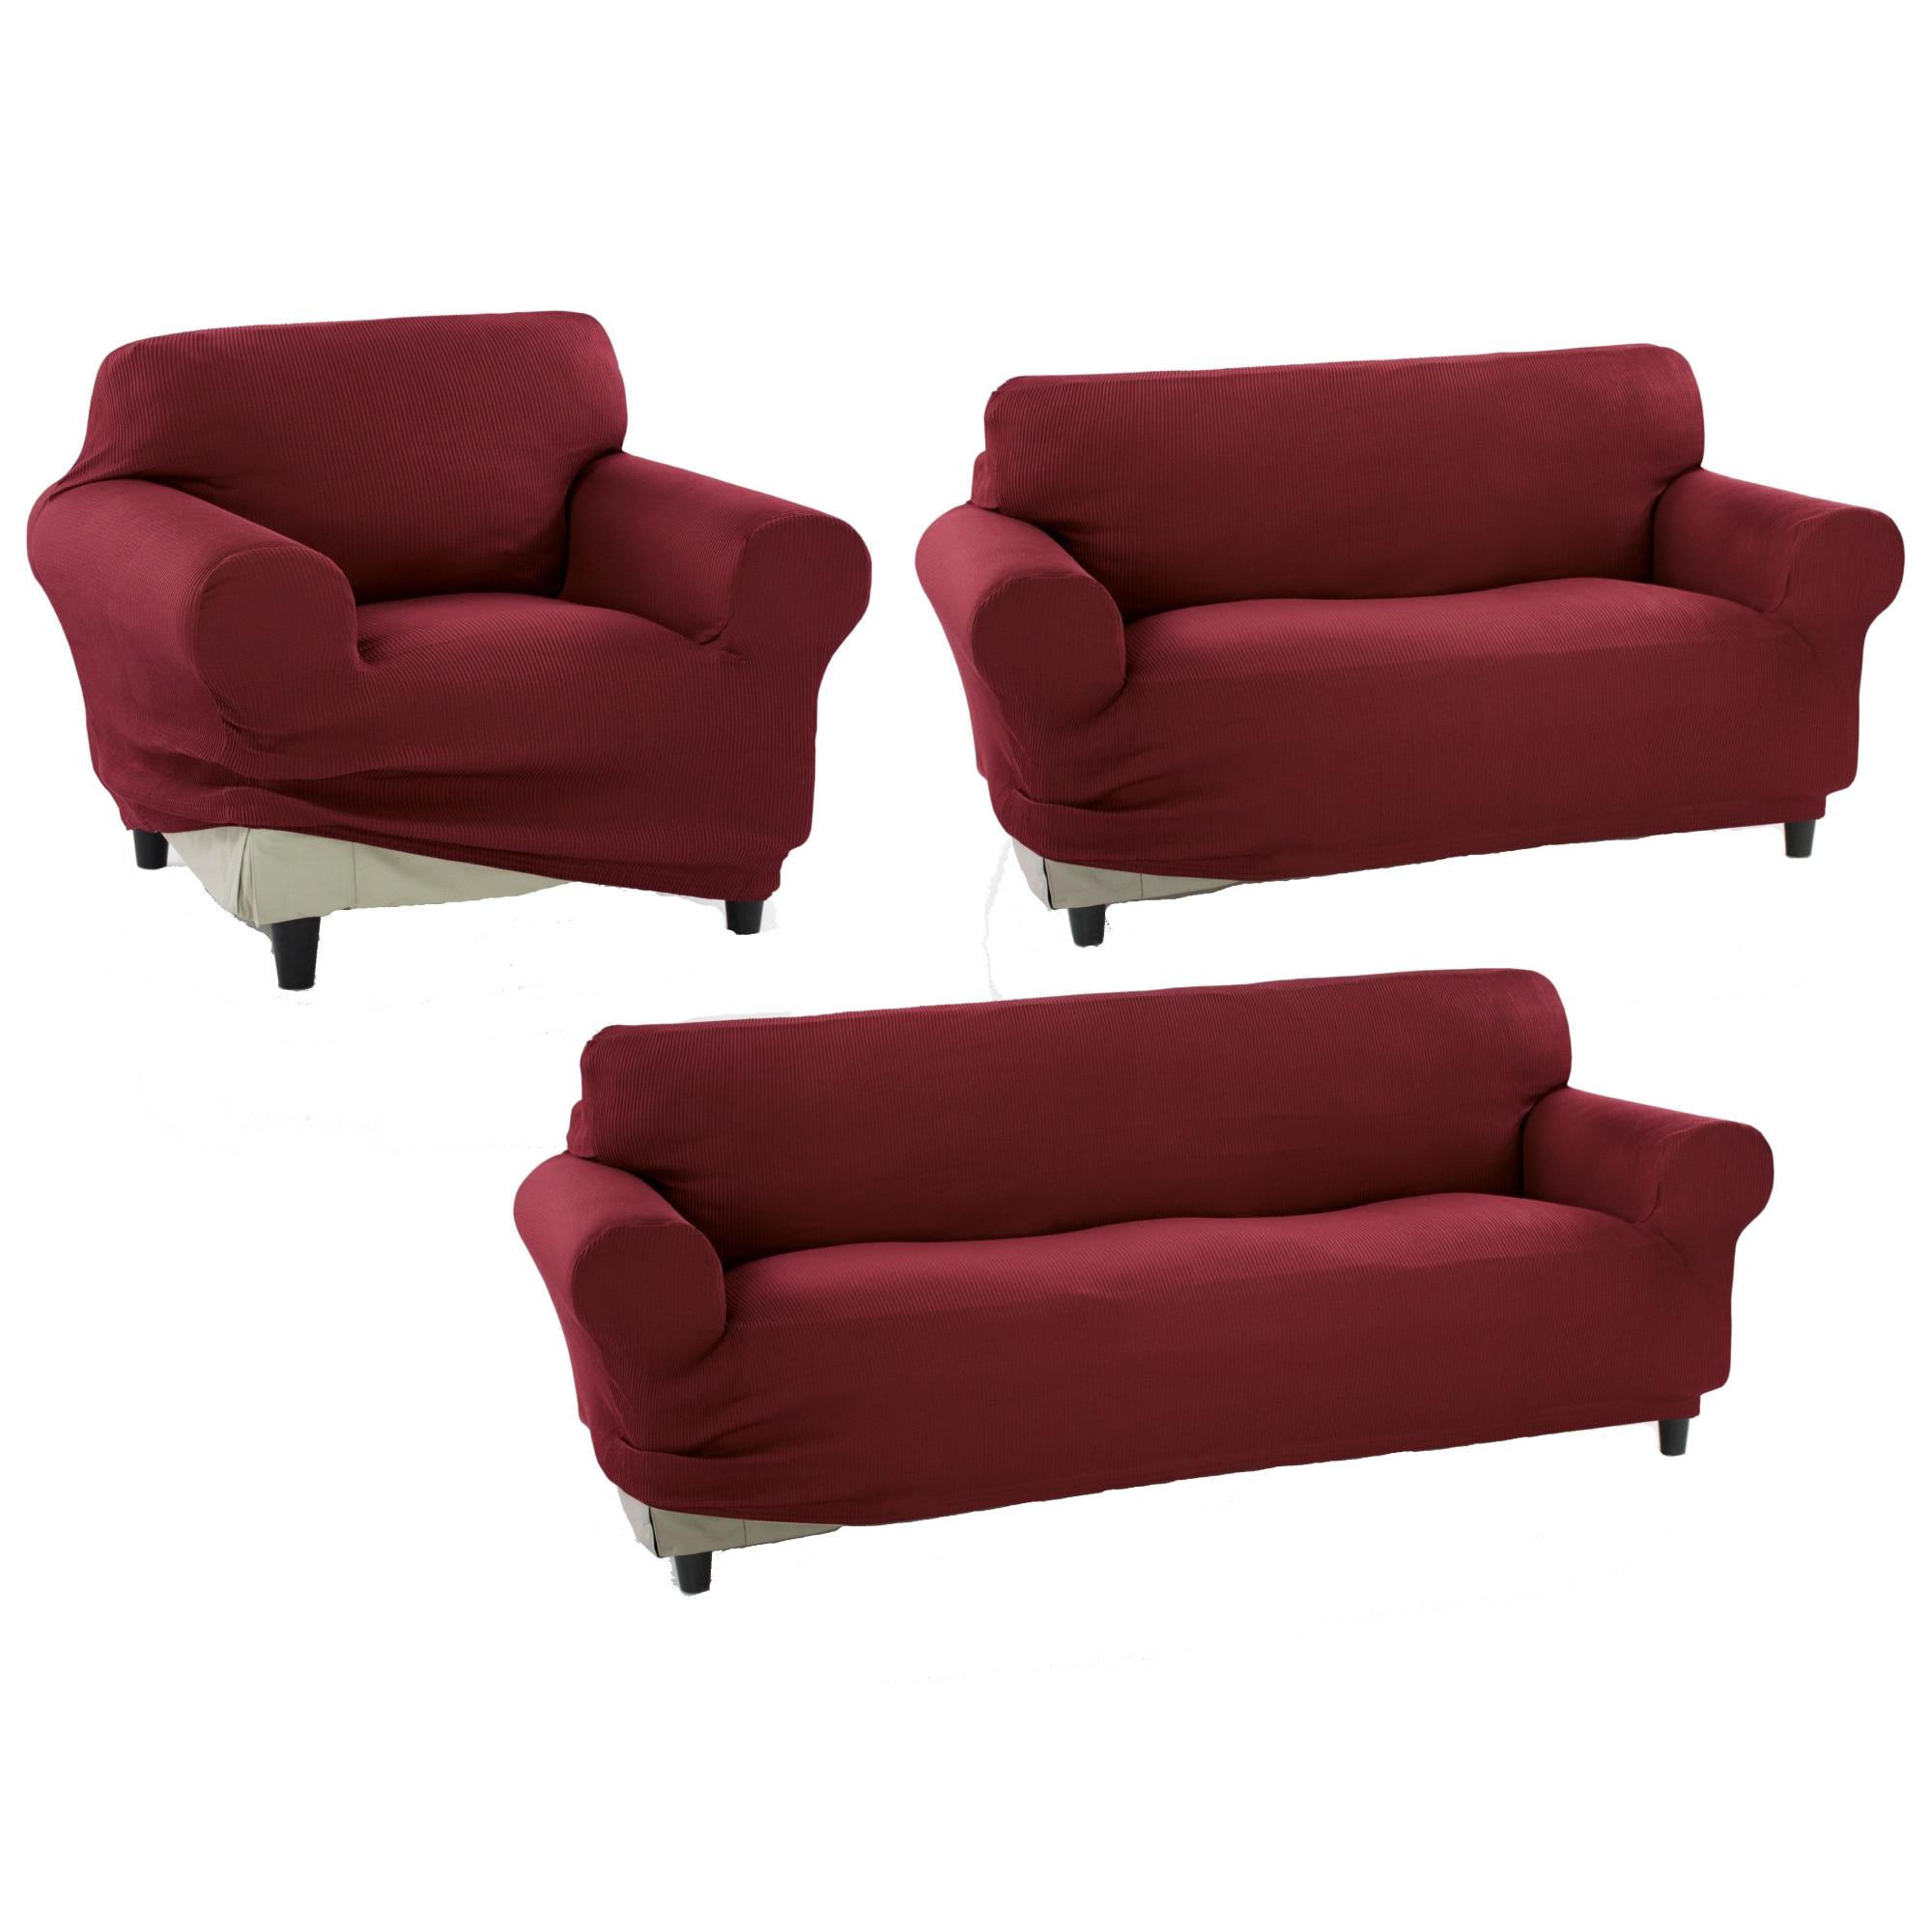 Fotografie Set huse elastice pentru o canapea 3 locuri, o canapea 2 locuri si 1 fotoliu Kring Nairobi, 60% bumbac+ 35% poliester + 5% elastan, Bordeaux